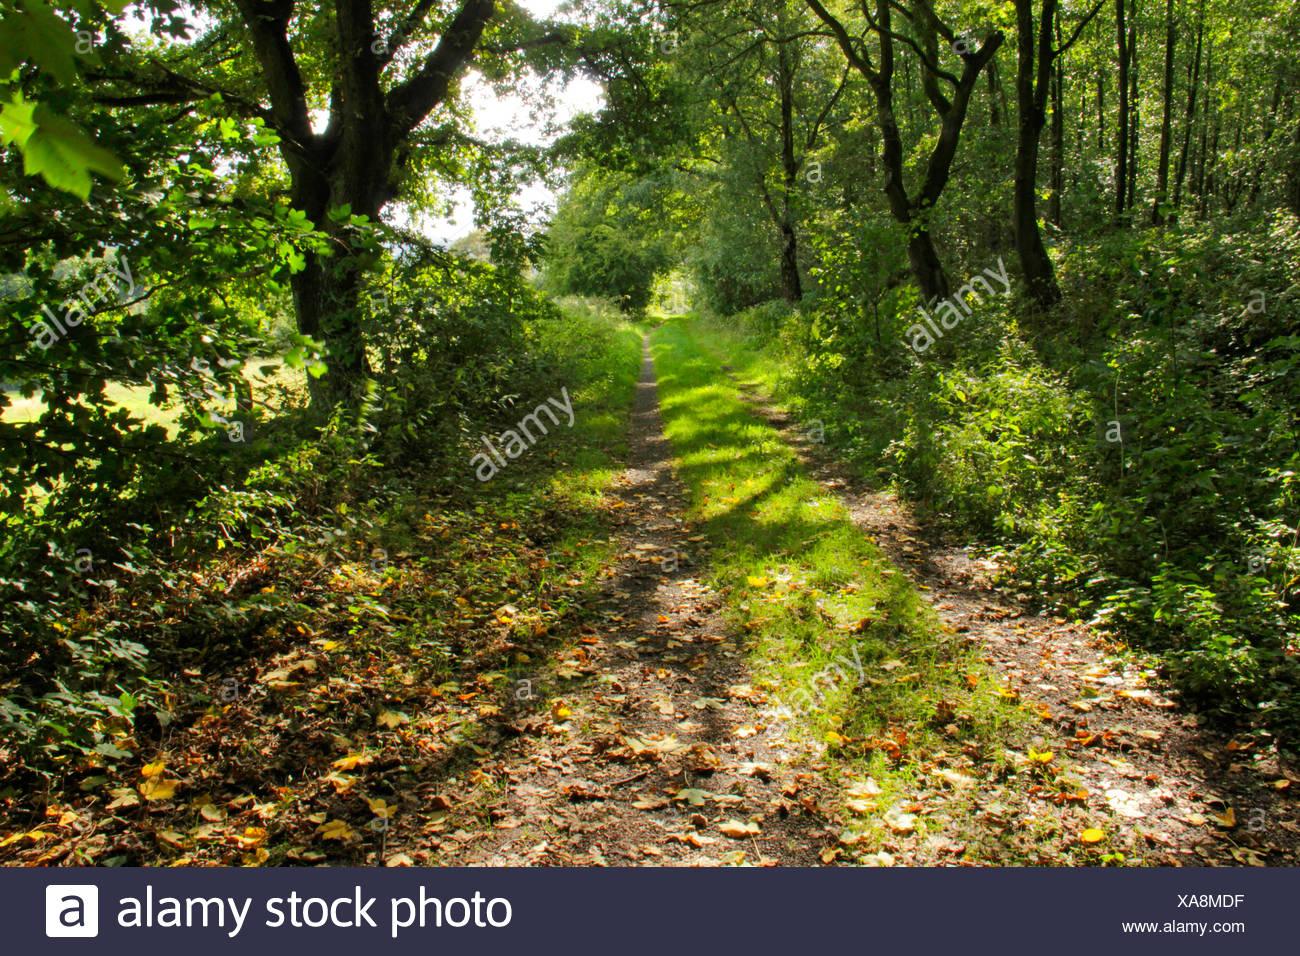 Way of St. James, pilgrims' path between Herdecke and Hagen, Germany, North Rhine-Westphalia, Ruhr Area, Herdecke - Stock Image